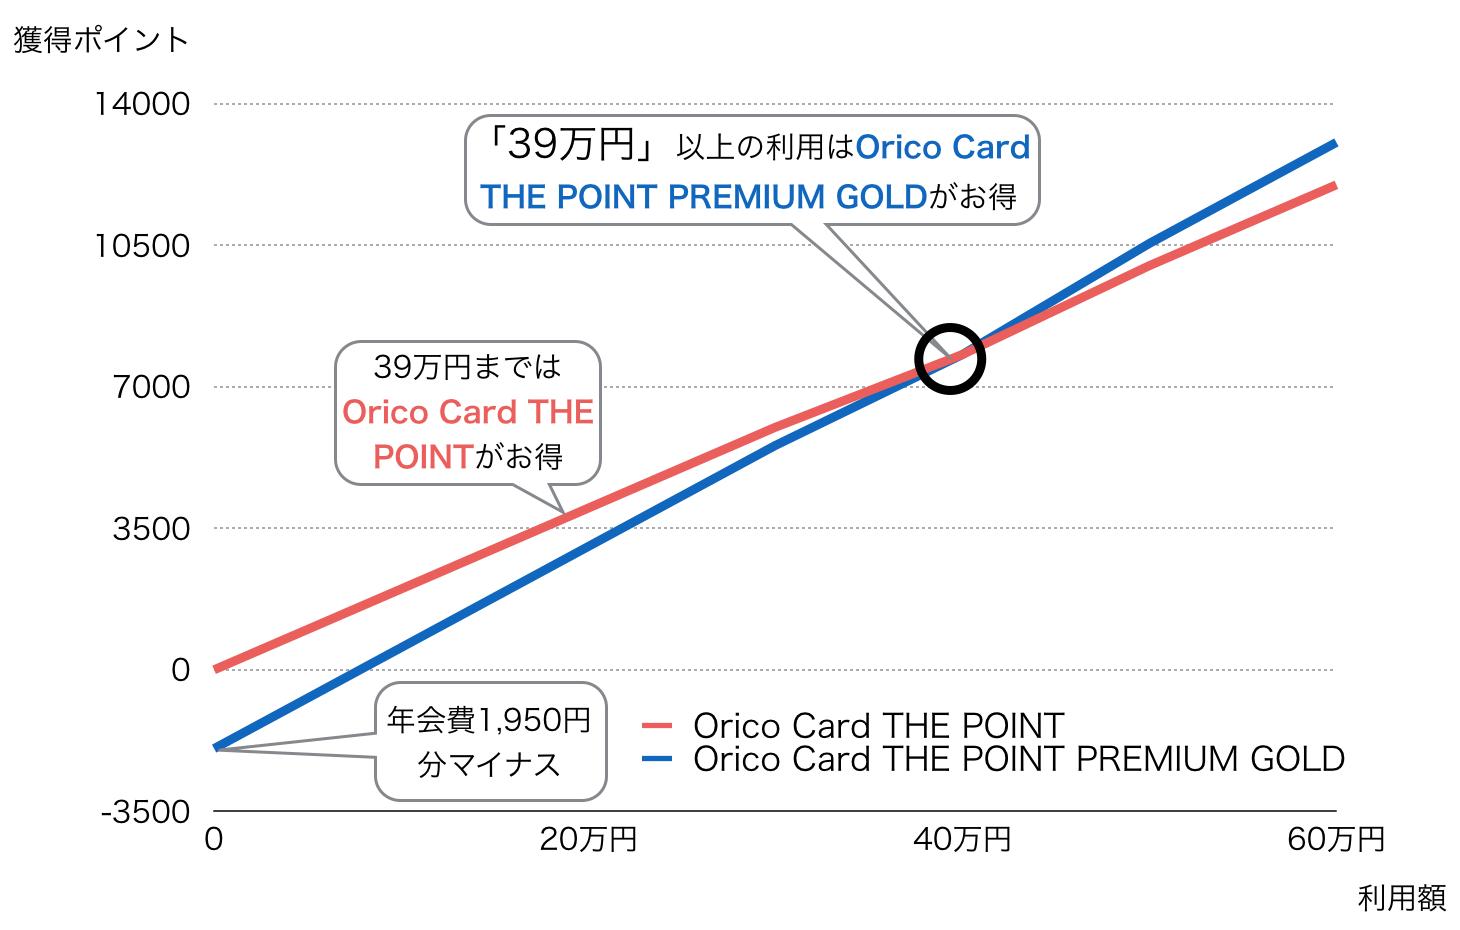 Orico Card THE POINT PREMIUM GOLDの損益分岐点